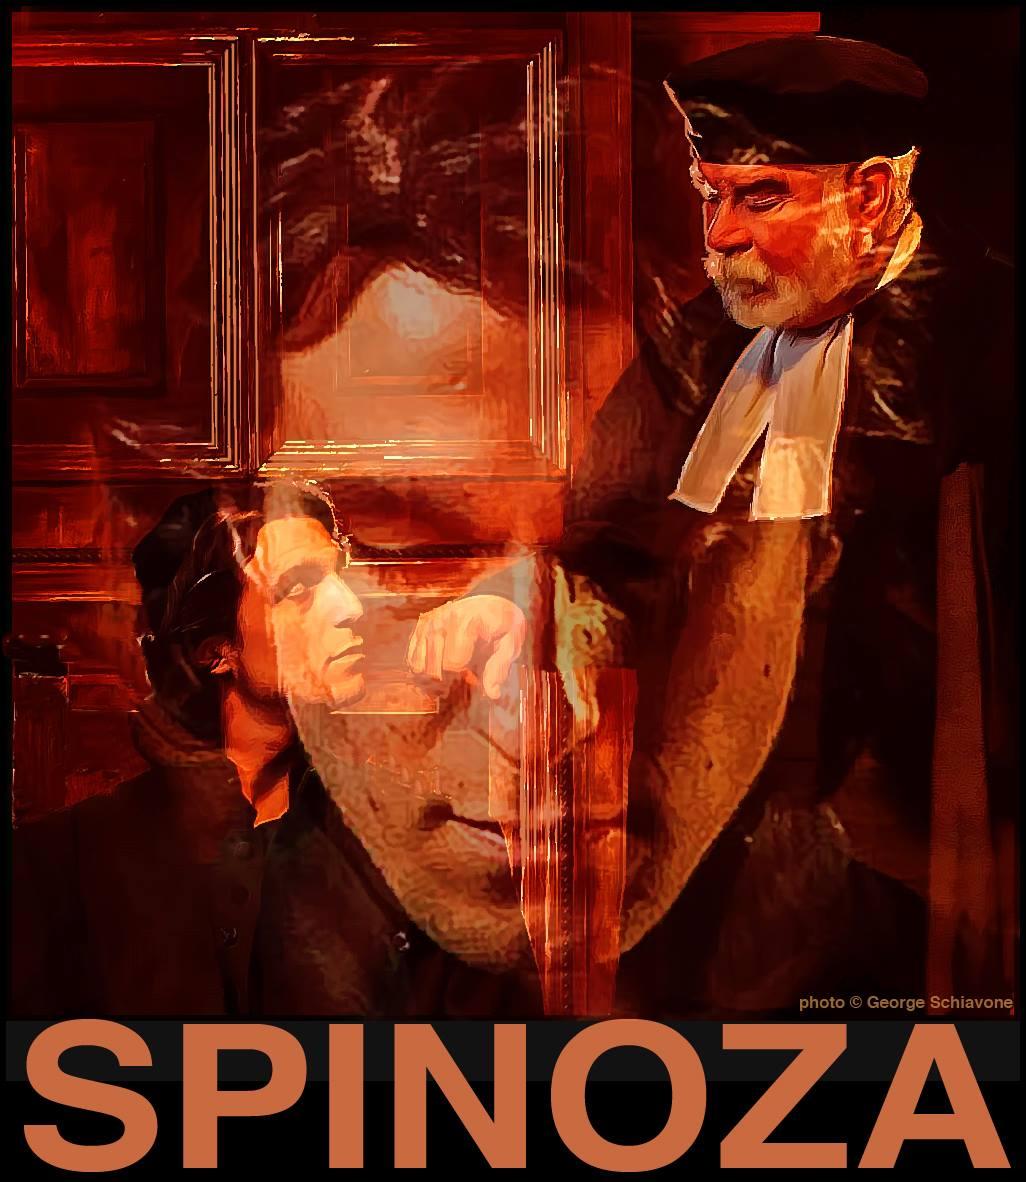 Baruch Spinoza in NEW JERUSALEM GableStage